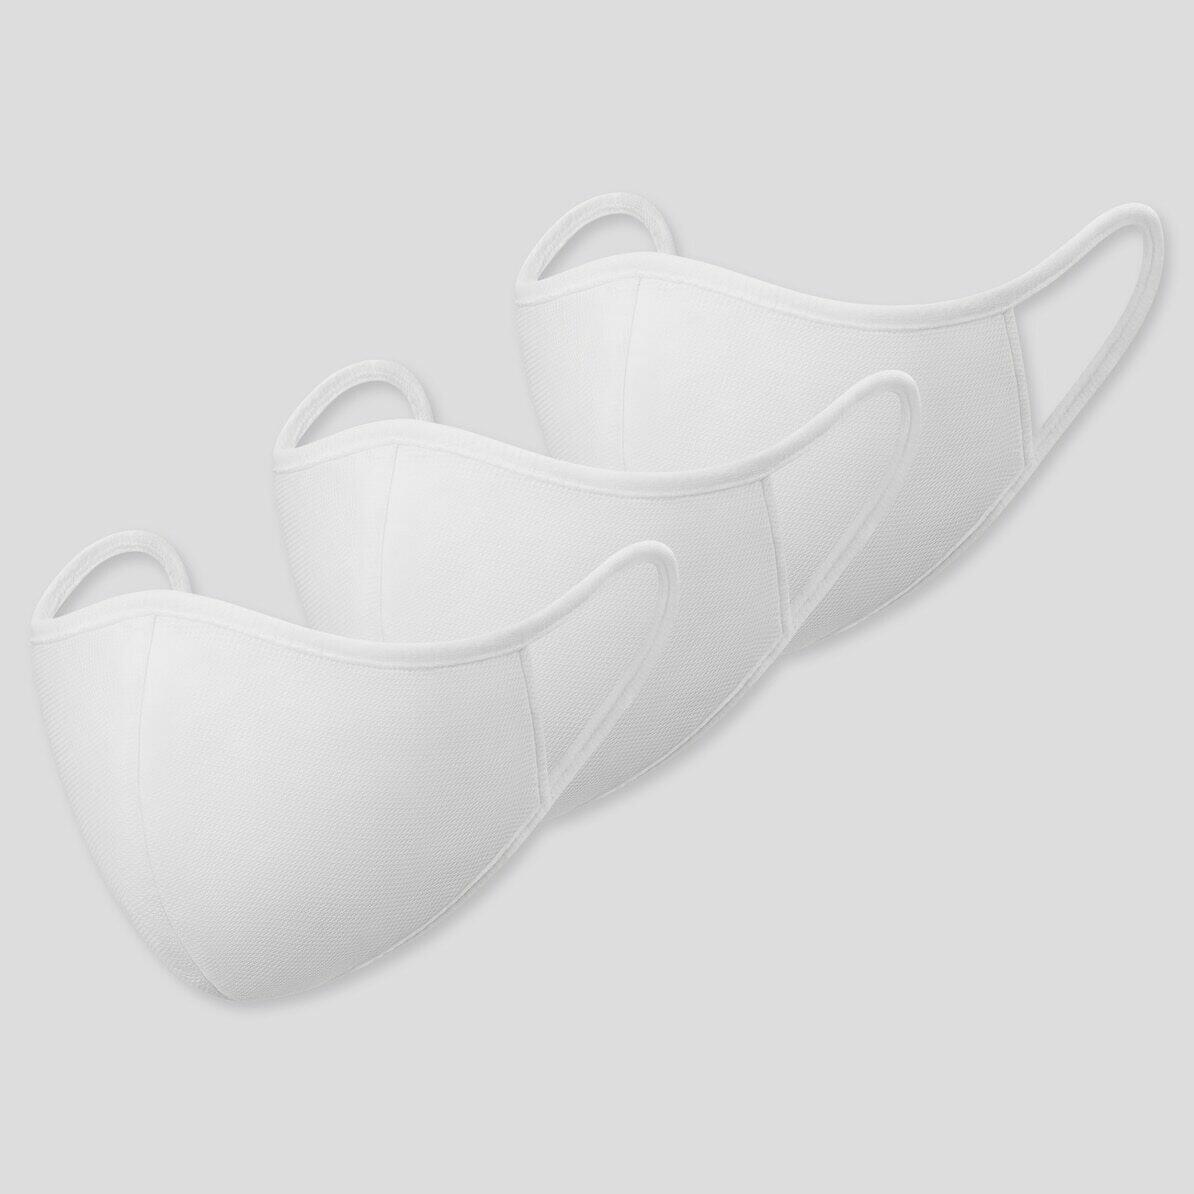 Uniqlo AIRism Mask (Tamanho P)